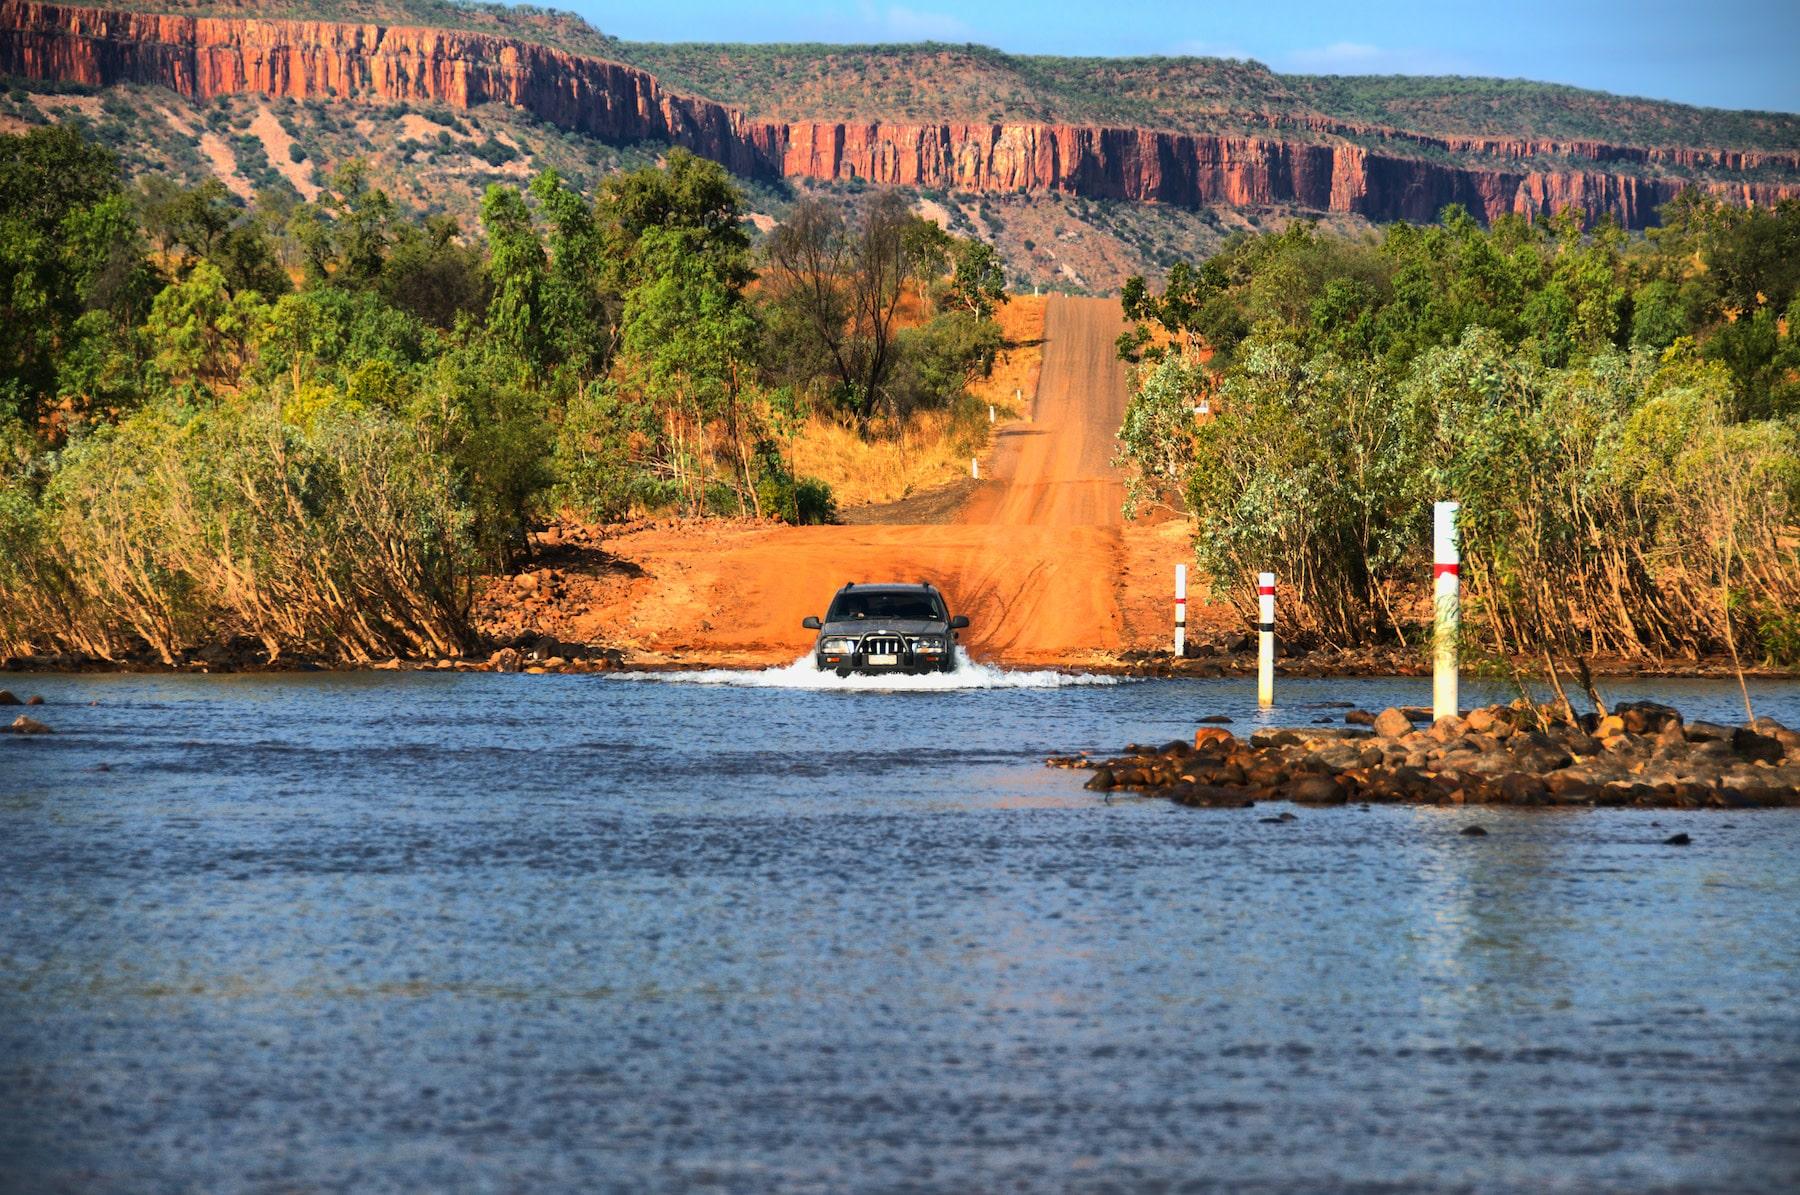 The Gibb river road